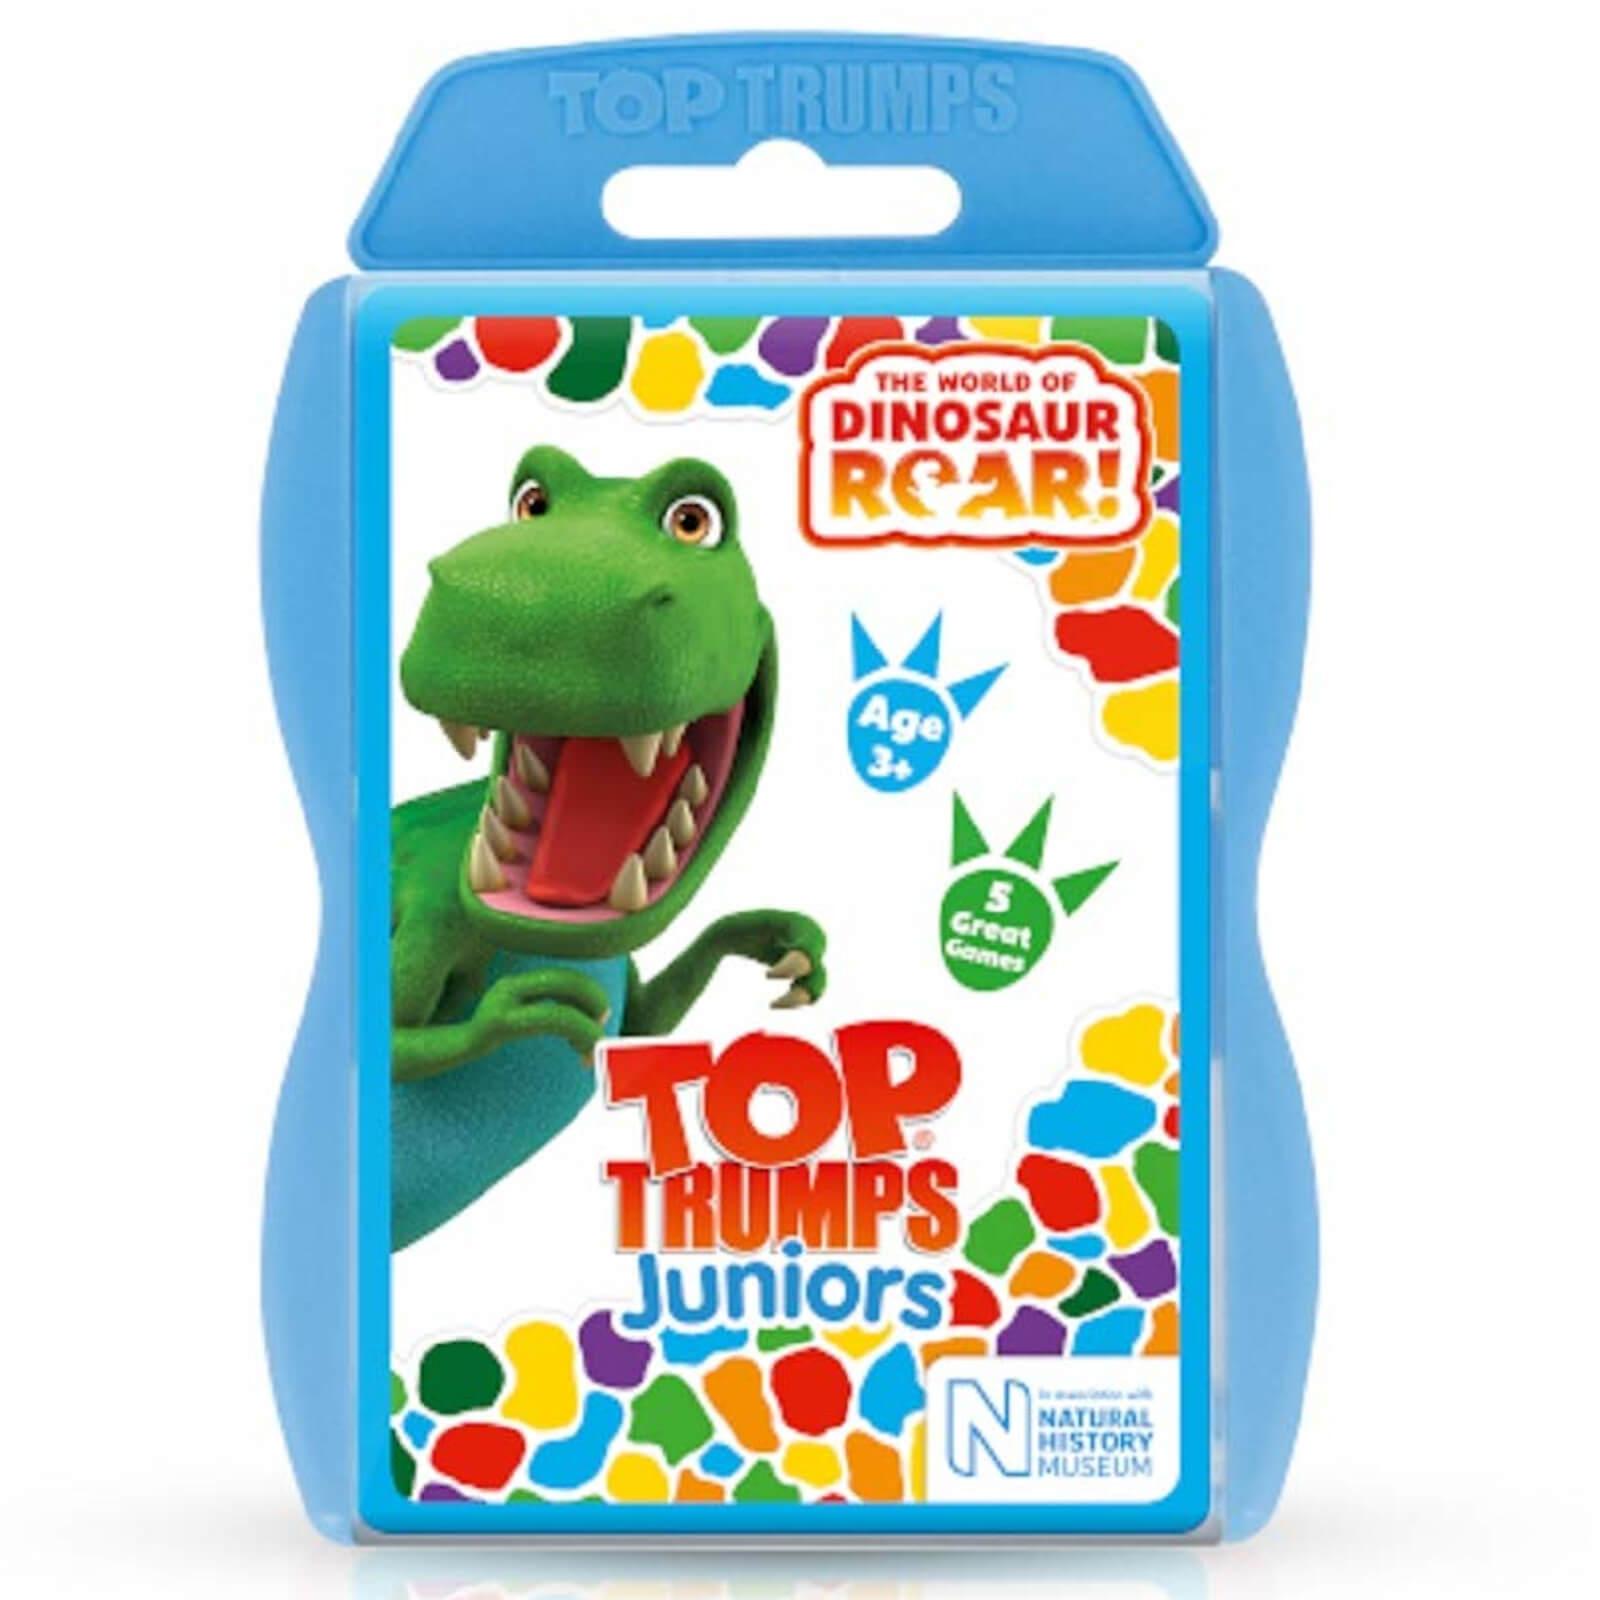 Image of Top Trumps Card Game - Dinosaur Roar Edition